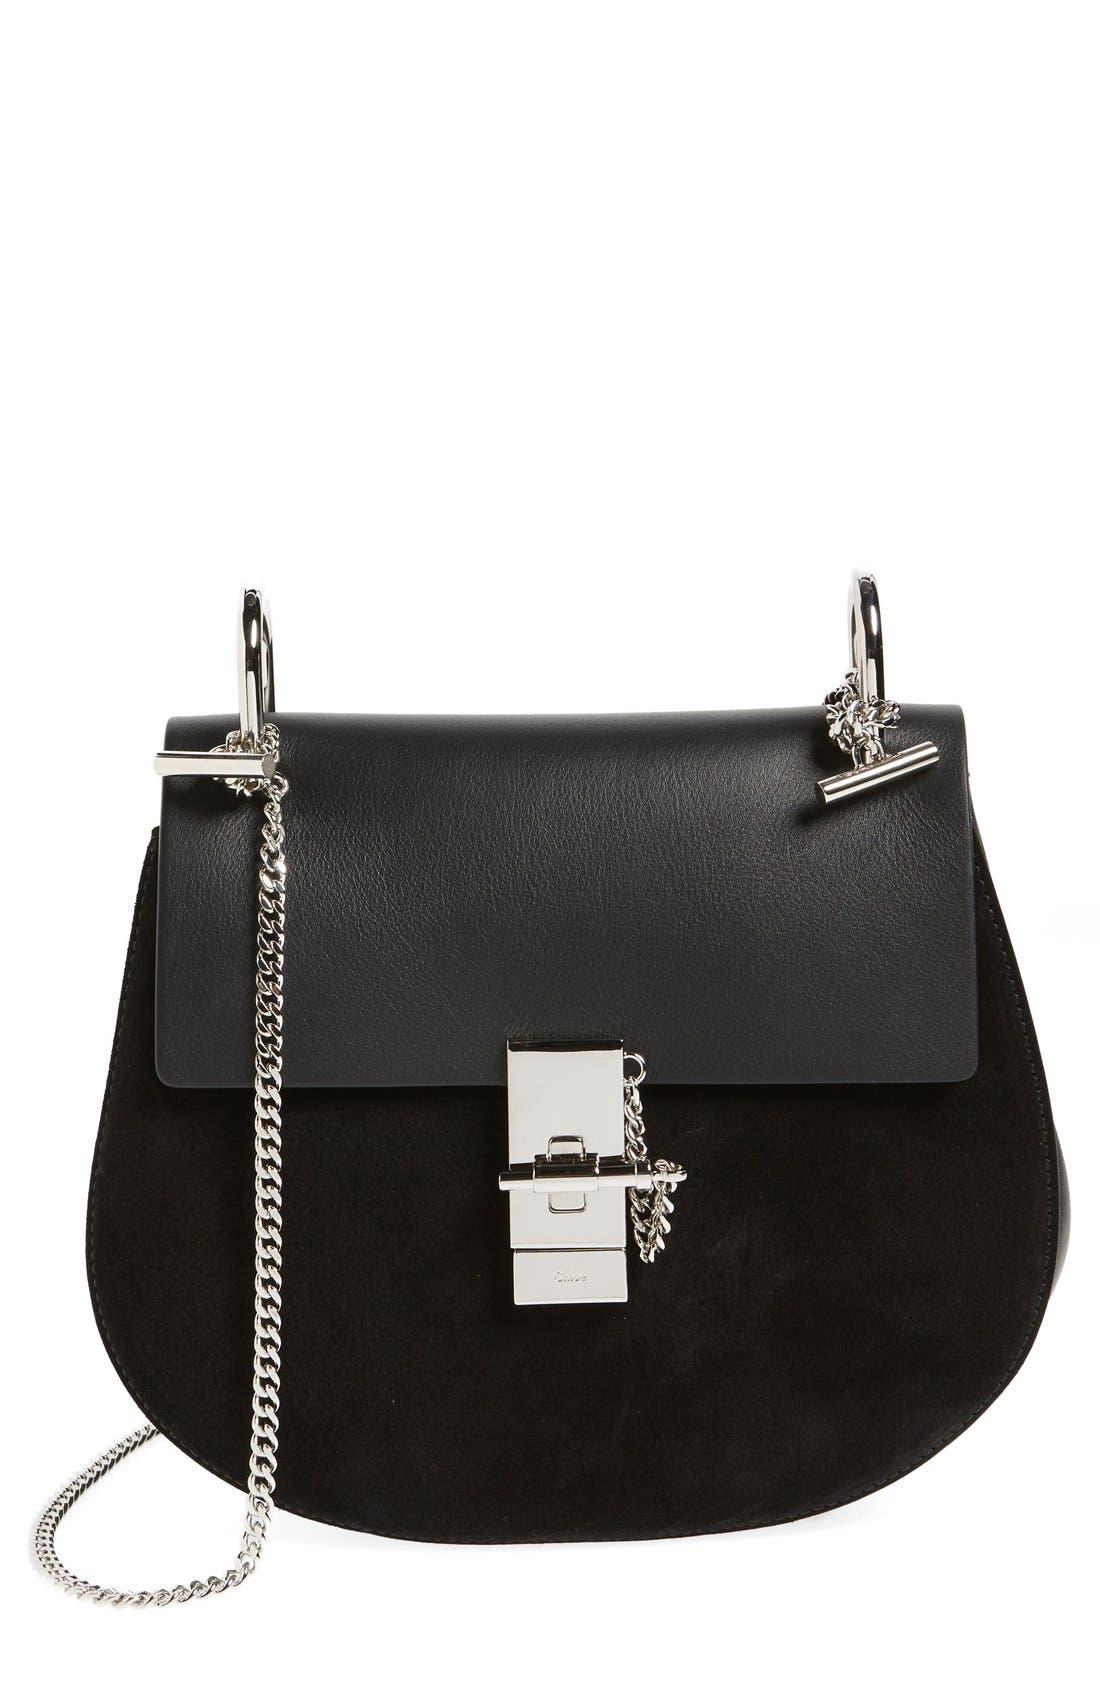 CHLOÉ Small Drew Leather & Suede Shoulder Bag, Main, color, 001